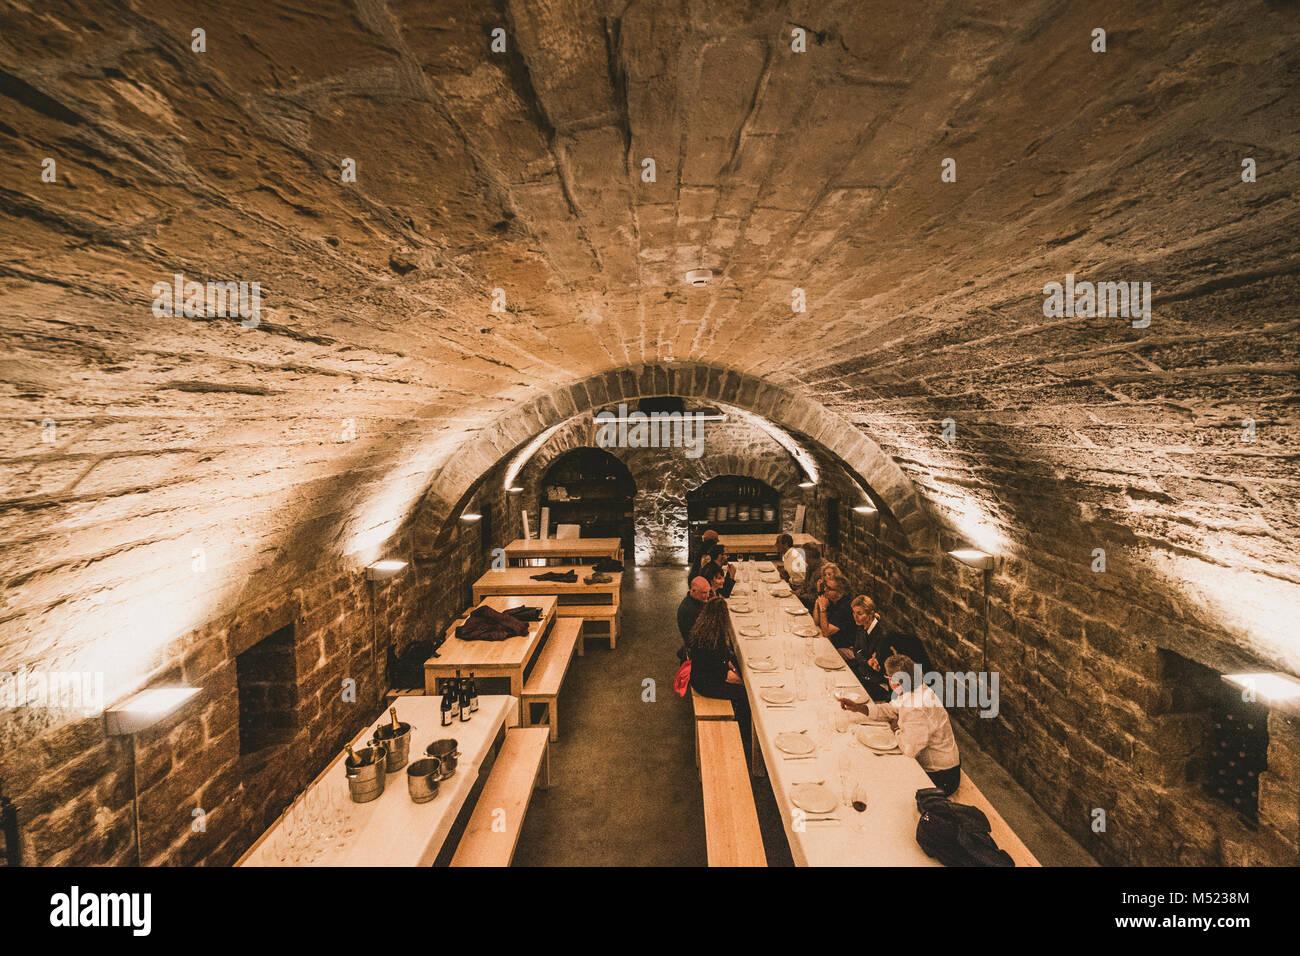 Dinner inside old wine cellar, Pamplona, Navarre, Spain Stock Photo